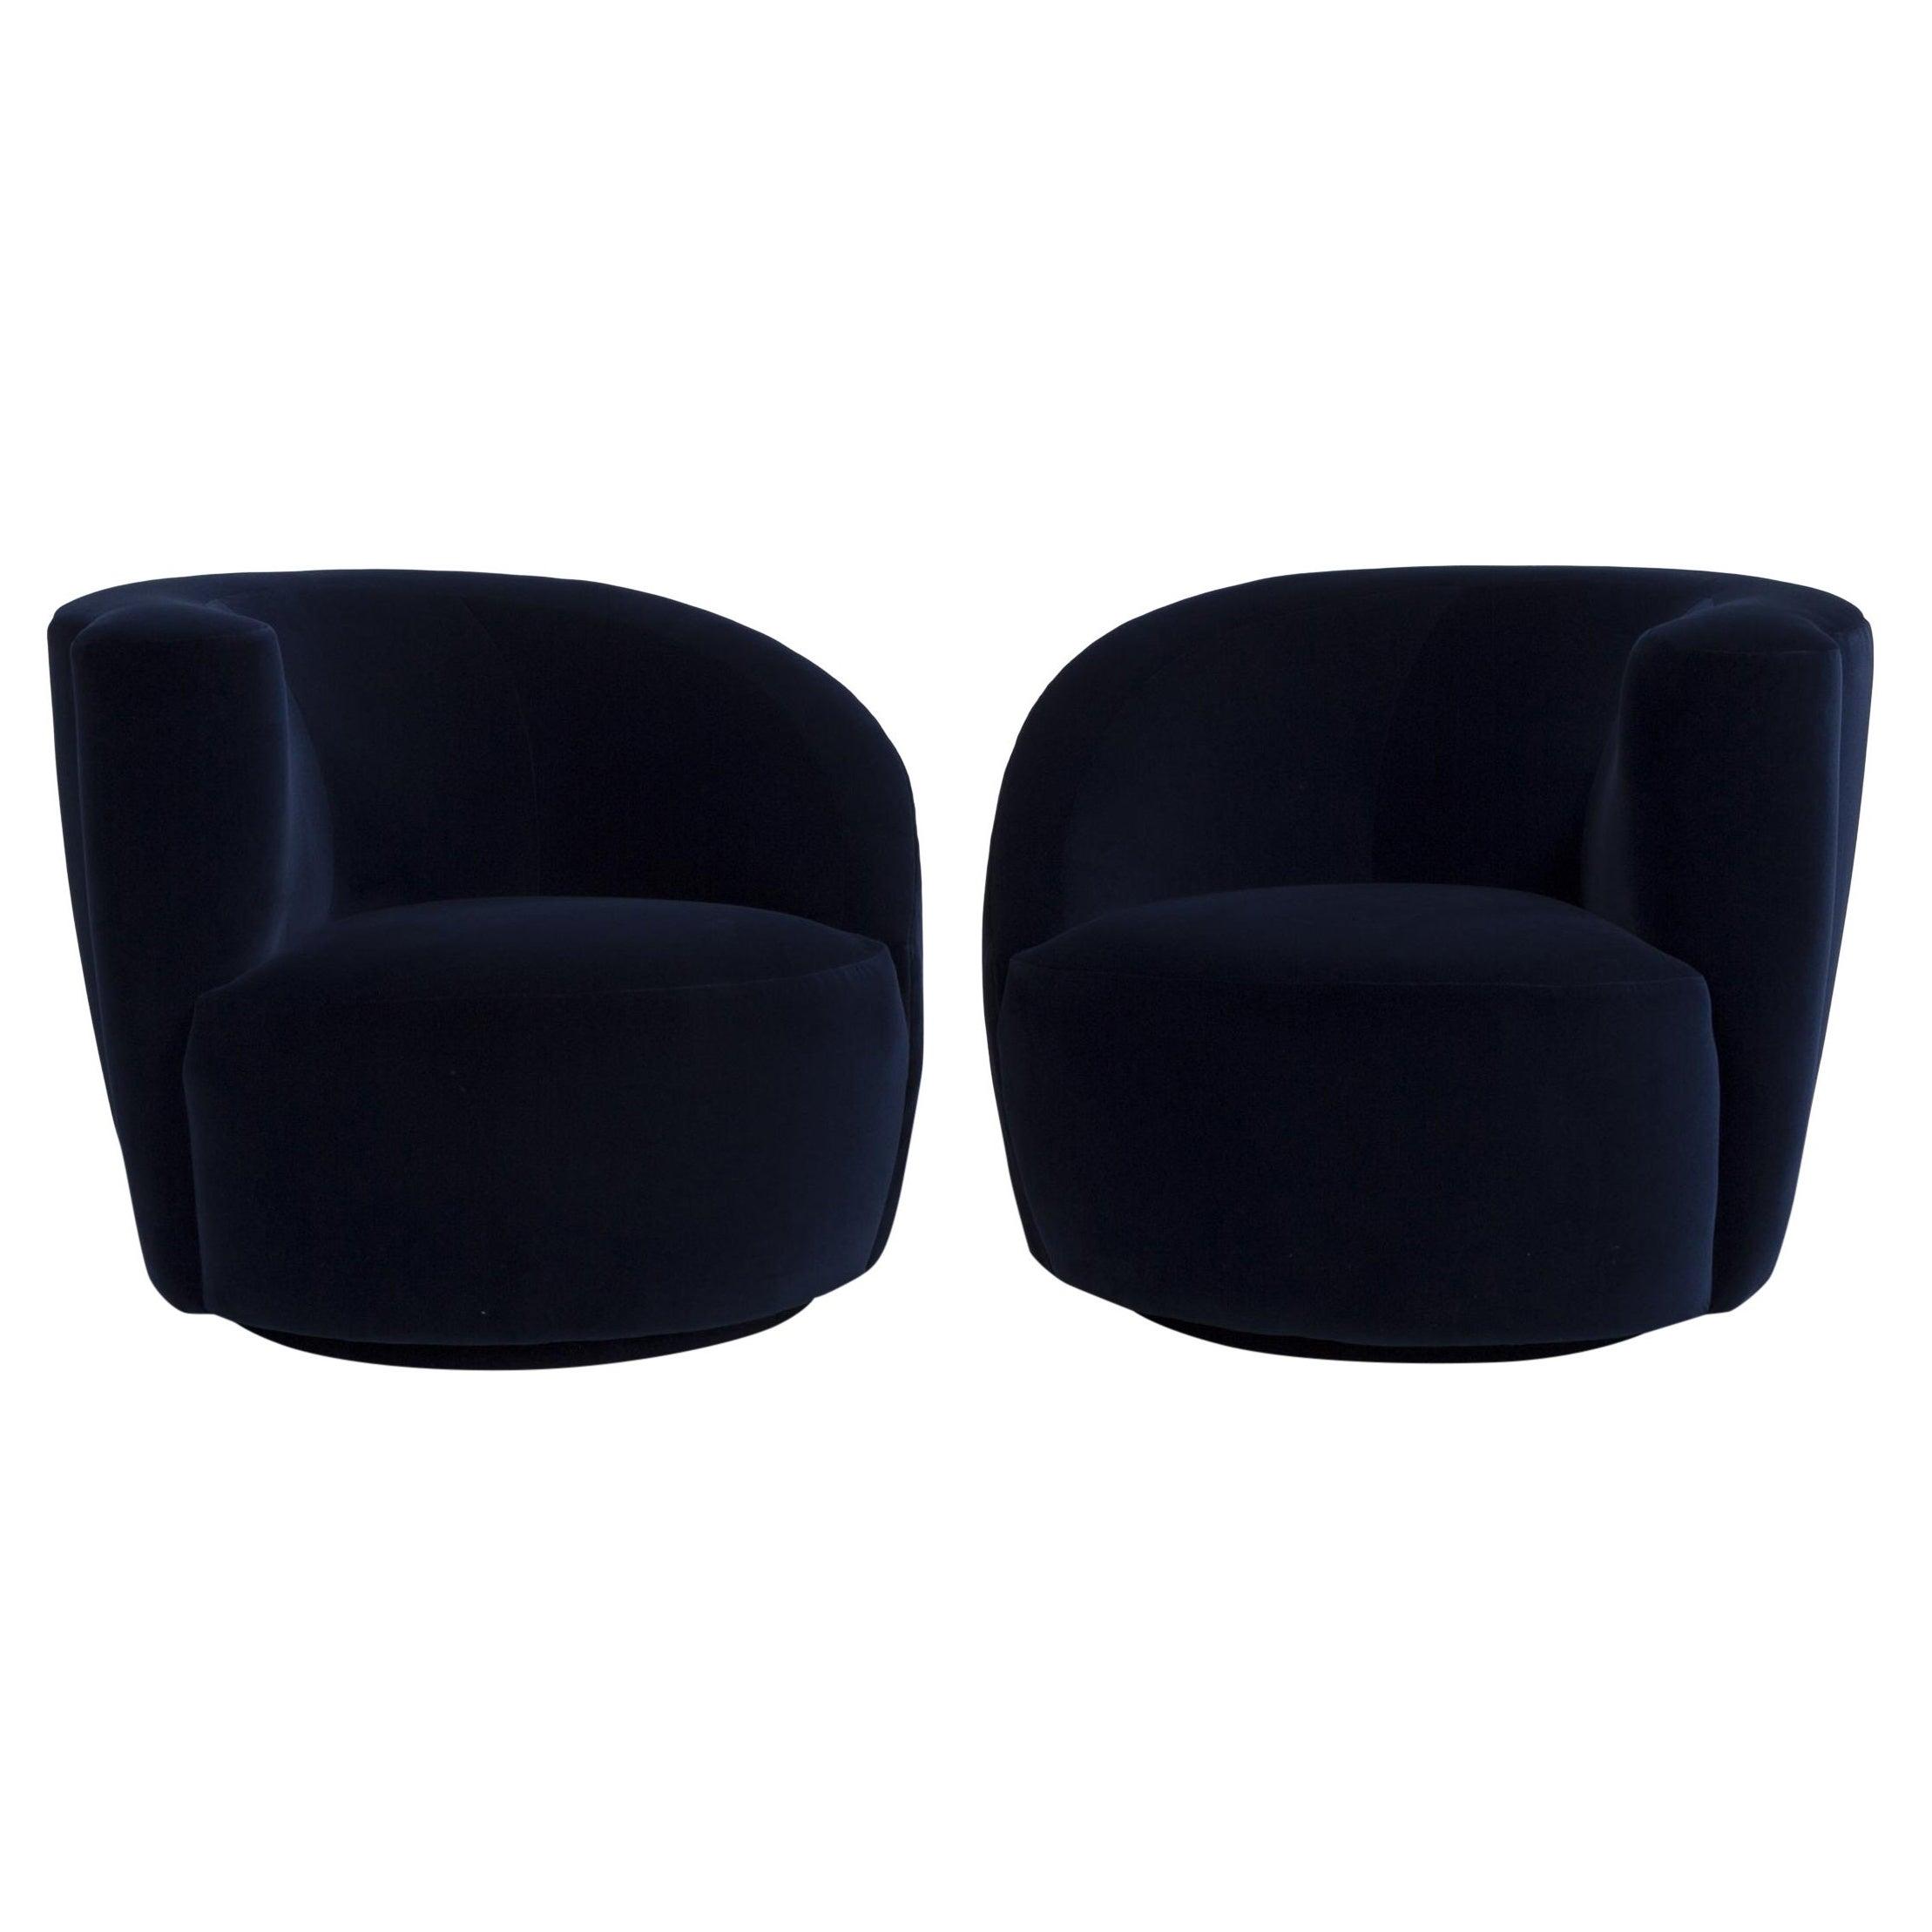 "Pair of Navy Blue Velvet Swiveling ""Nautilus"" Chairs by Vladimir Kagan"